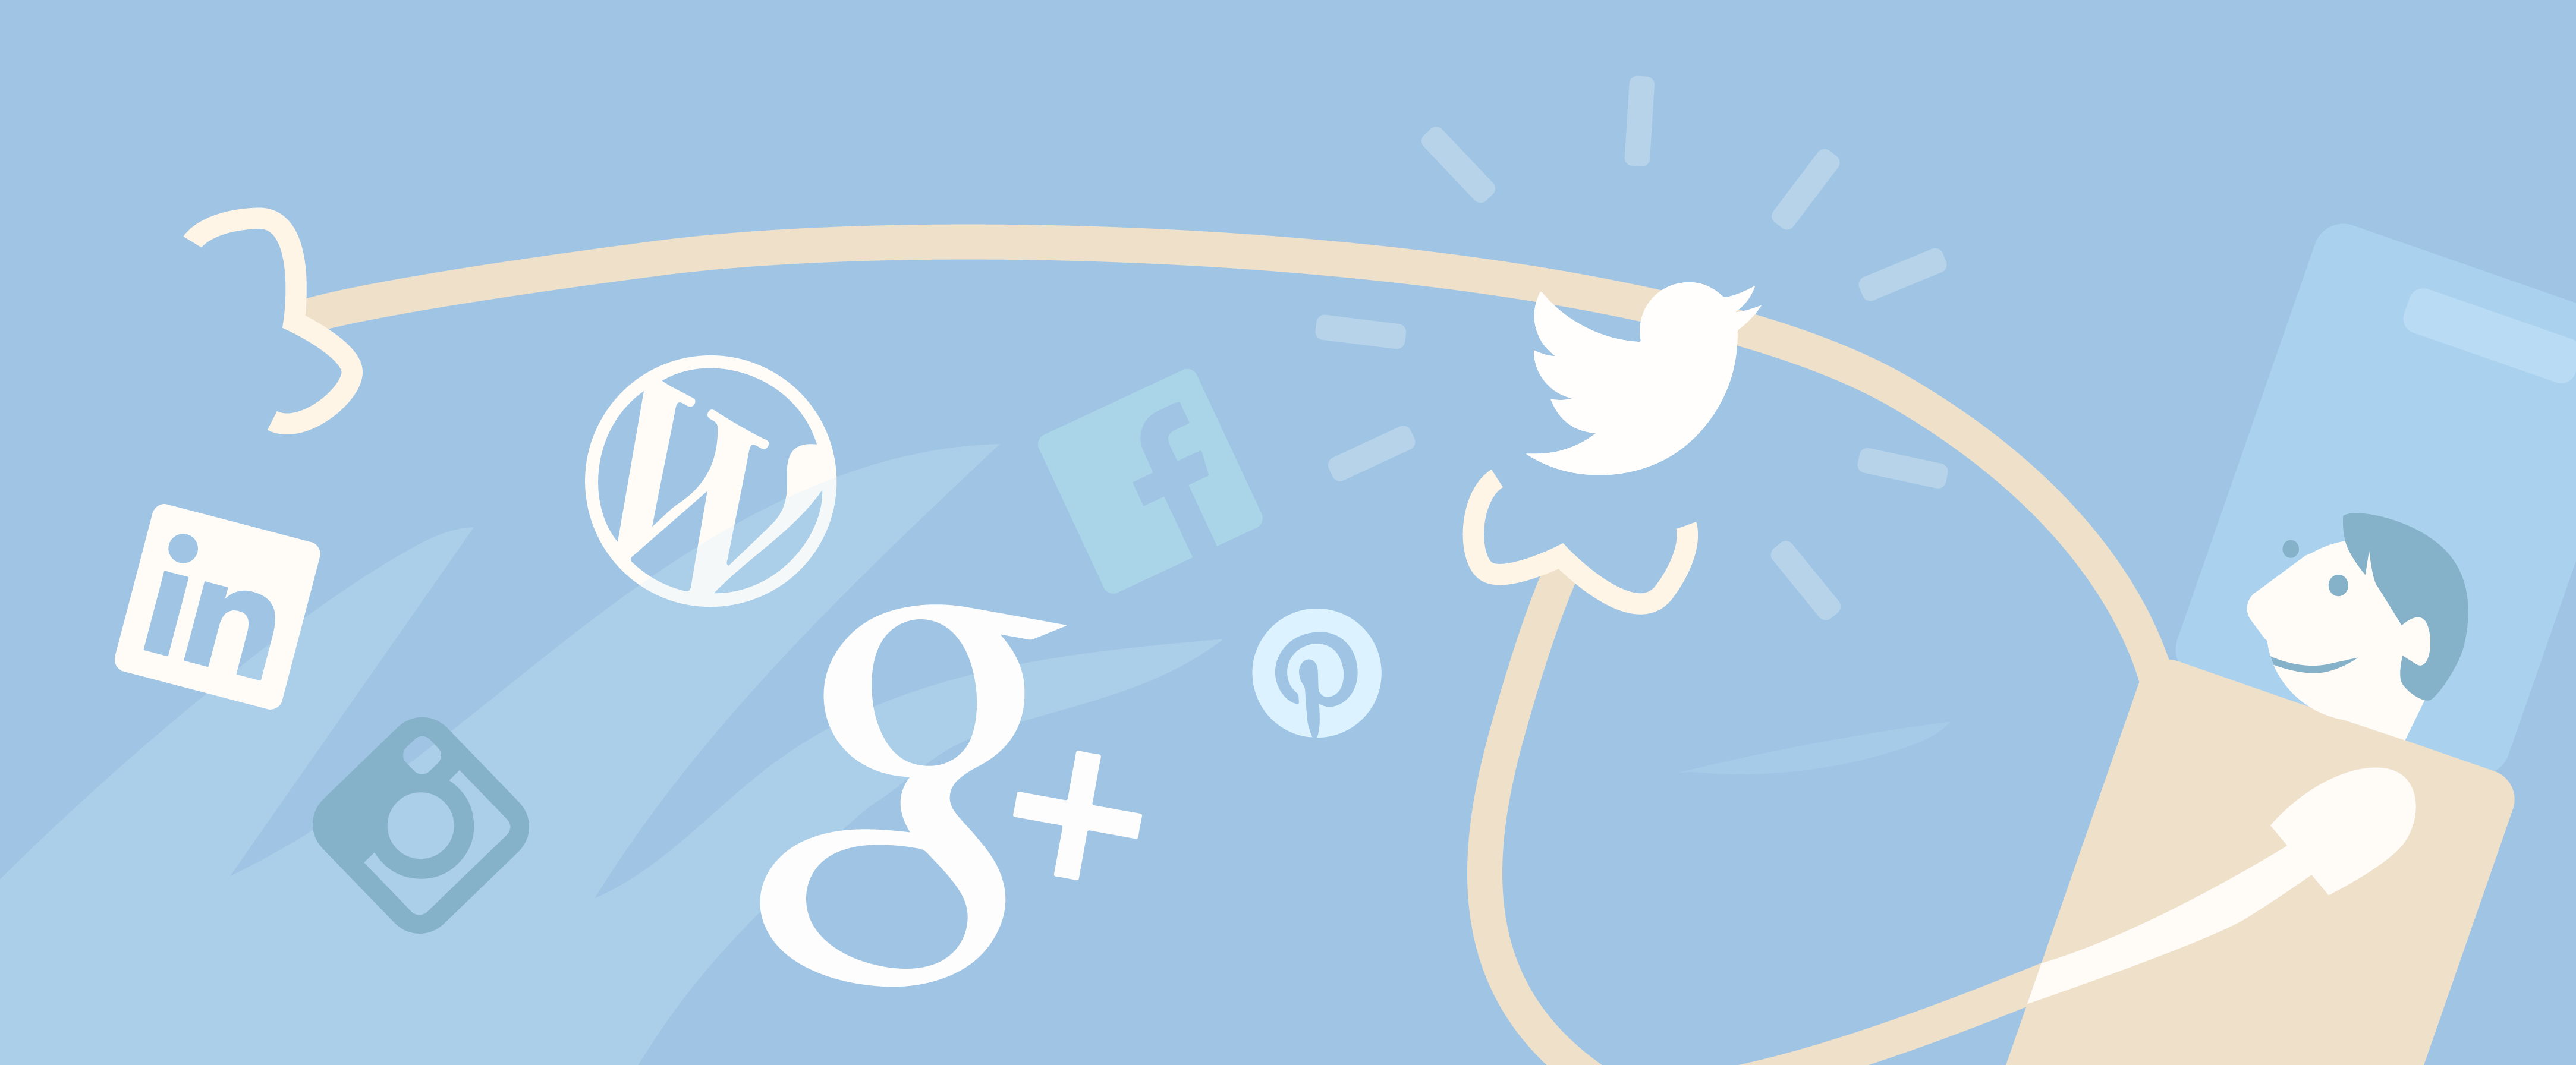 Free Twitter Tools